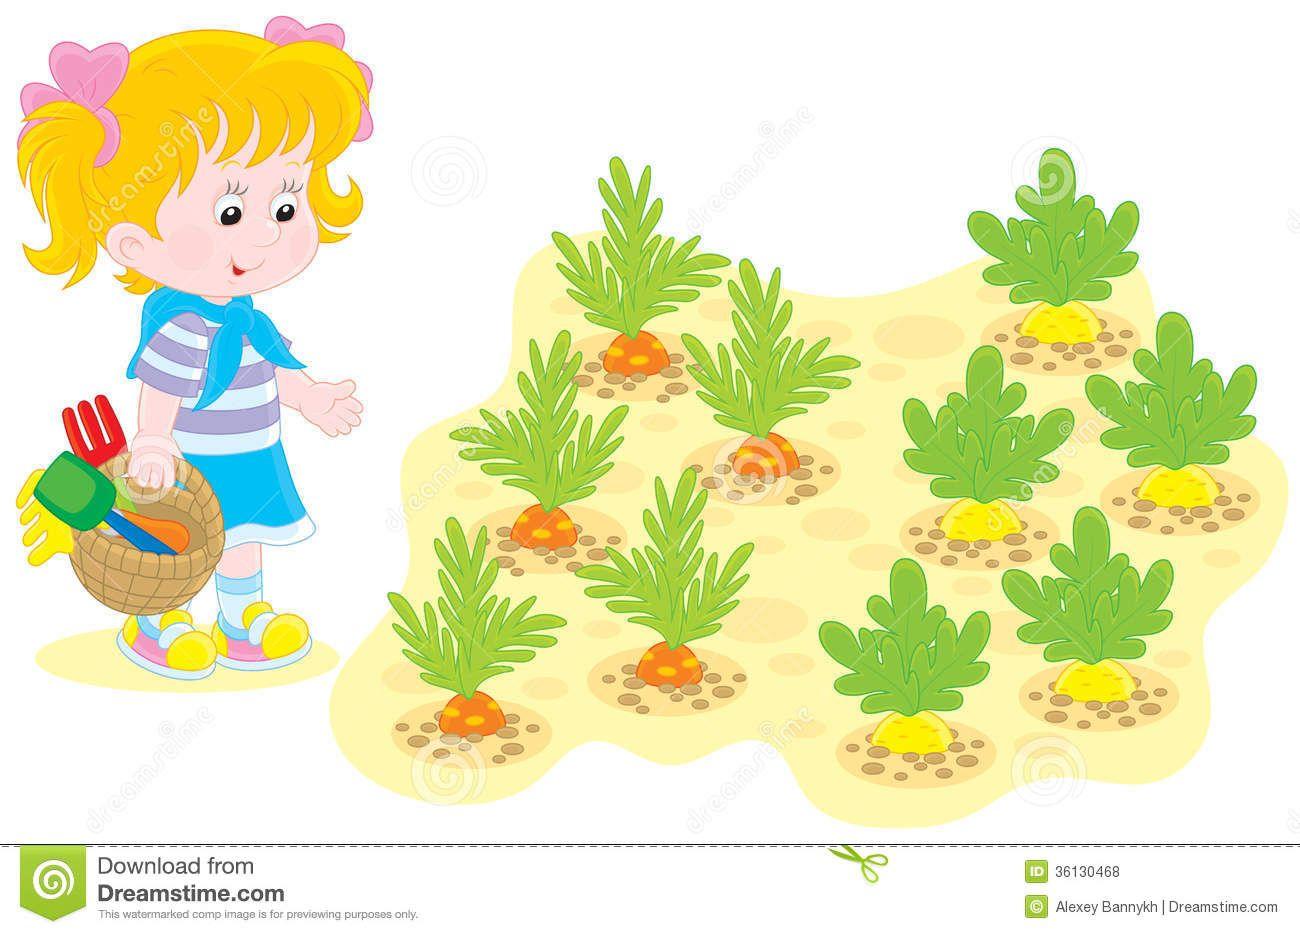 Gardening clipart vegetable garden. Graphic with kids